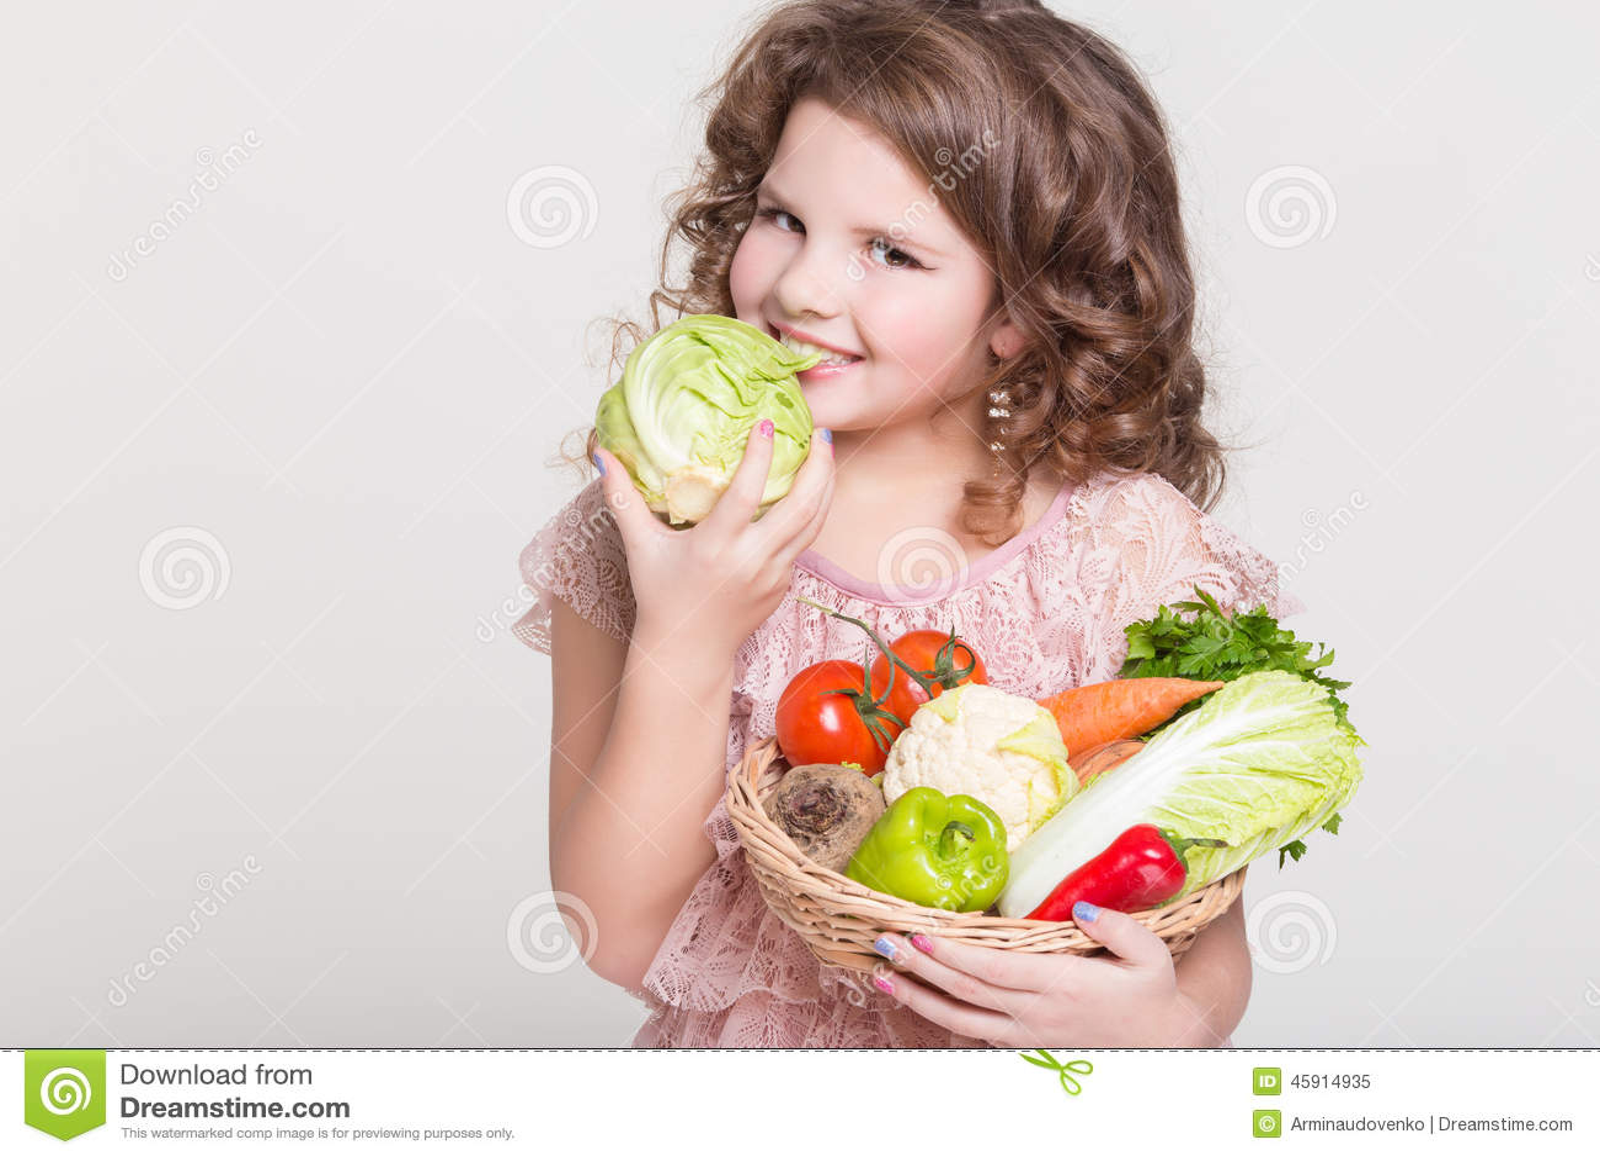 happy child portrait with organic vegetables  little girl fruit basket clipart png fruit basket clipart free